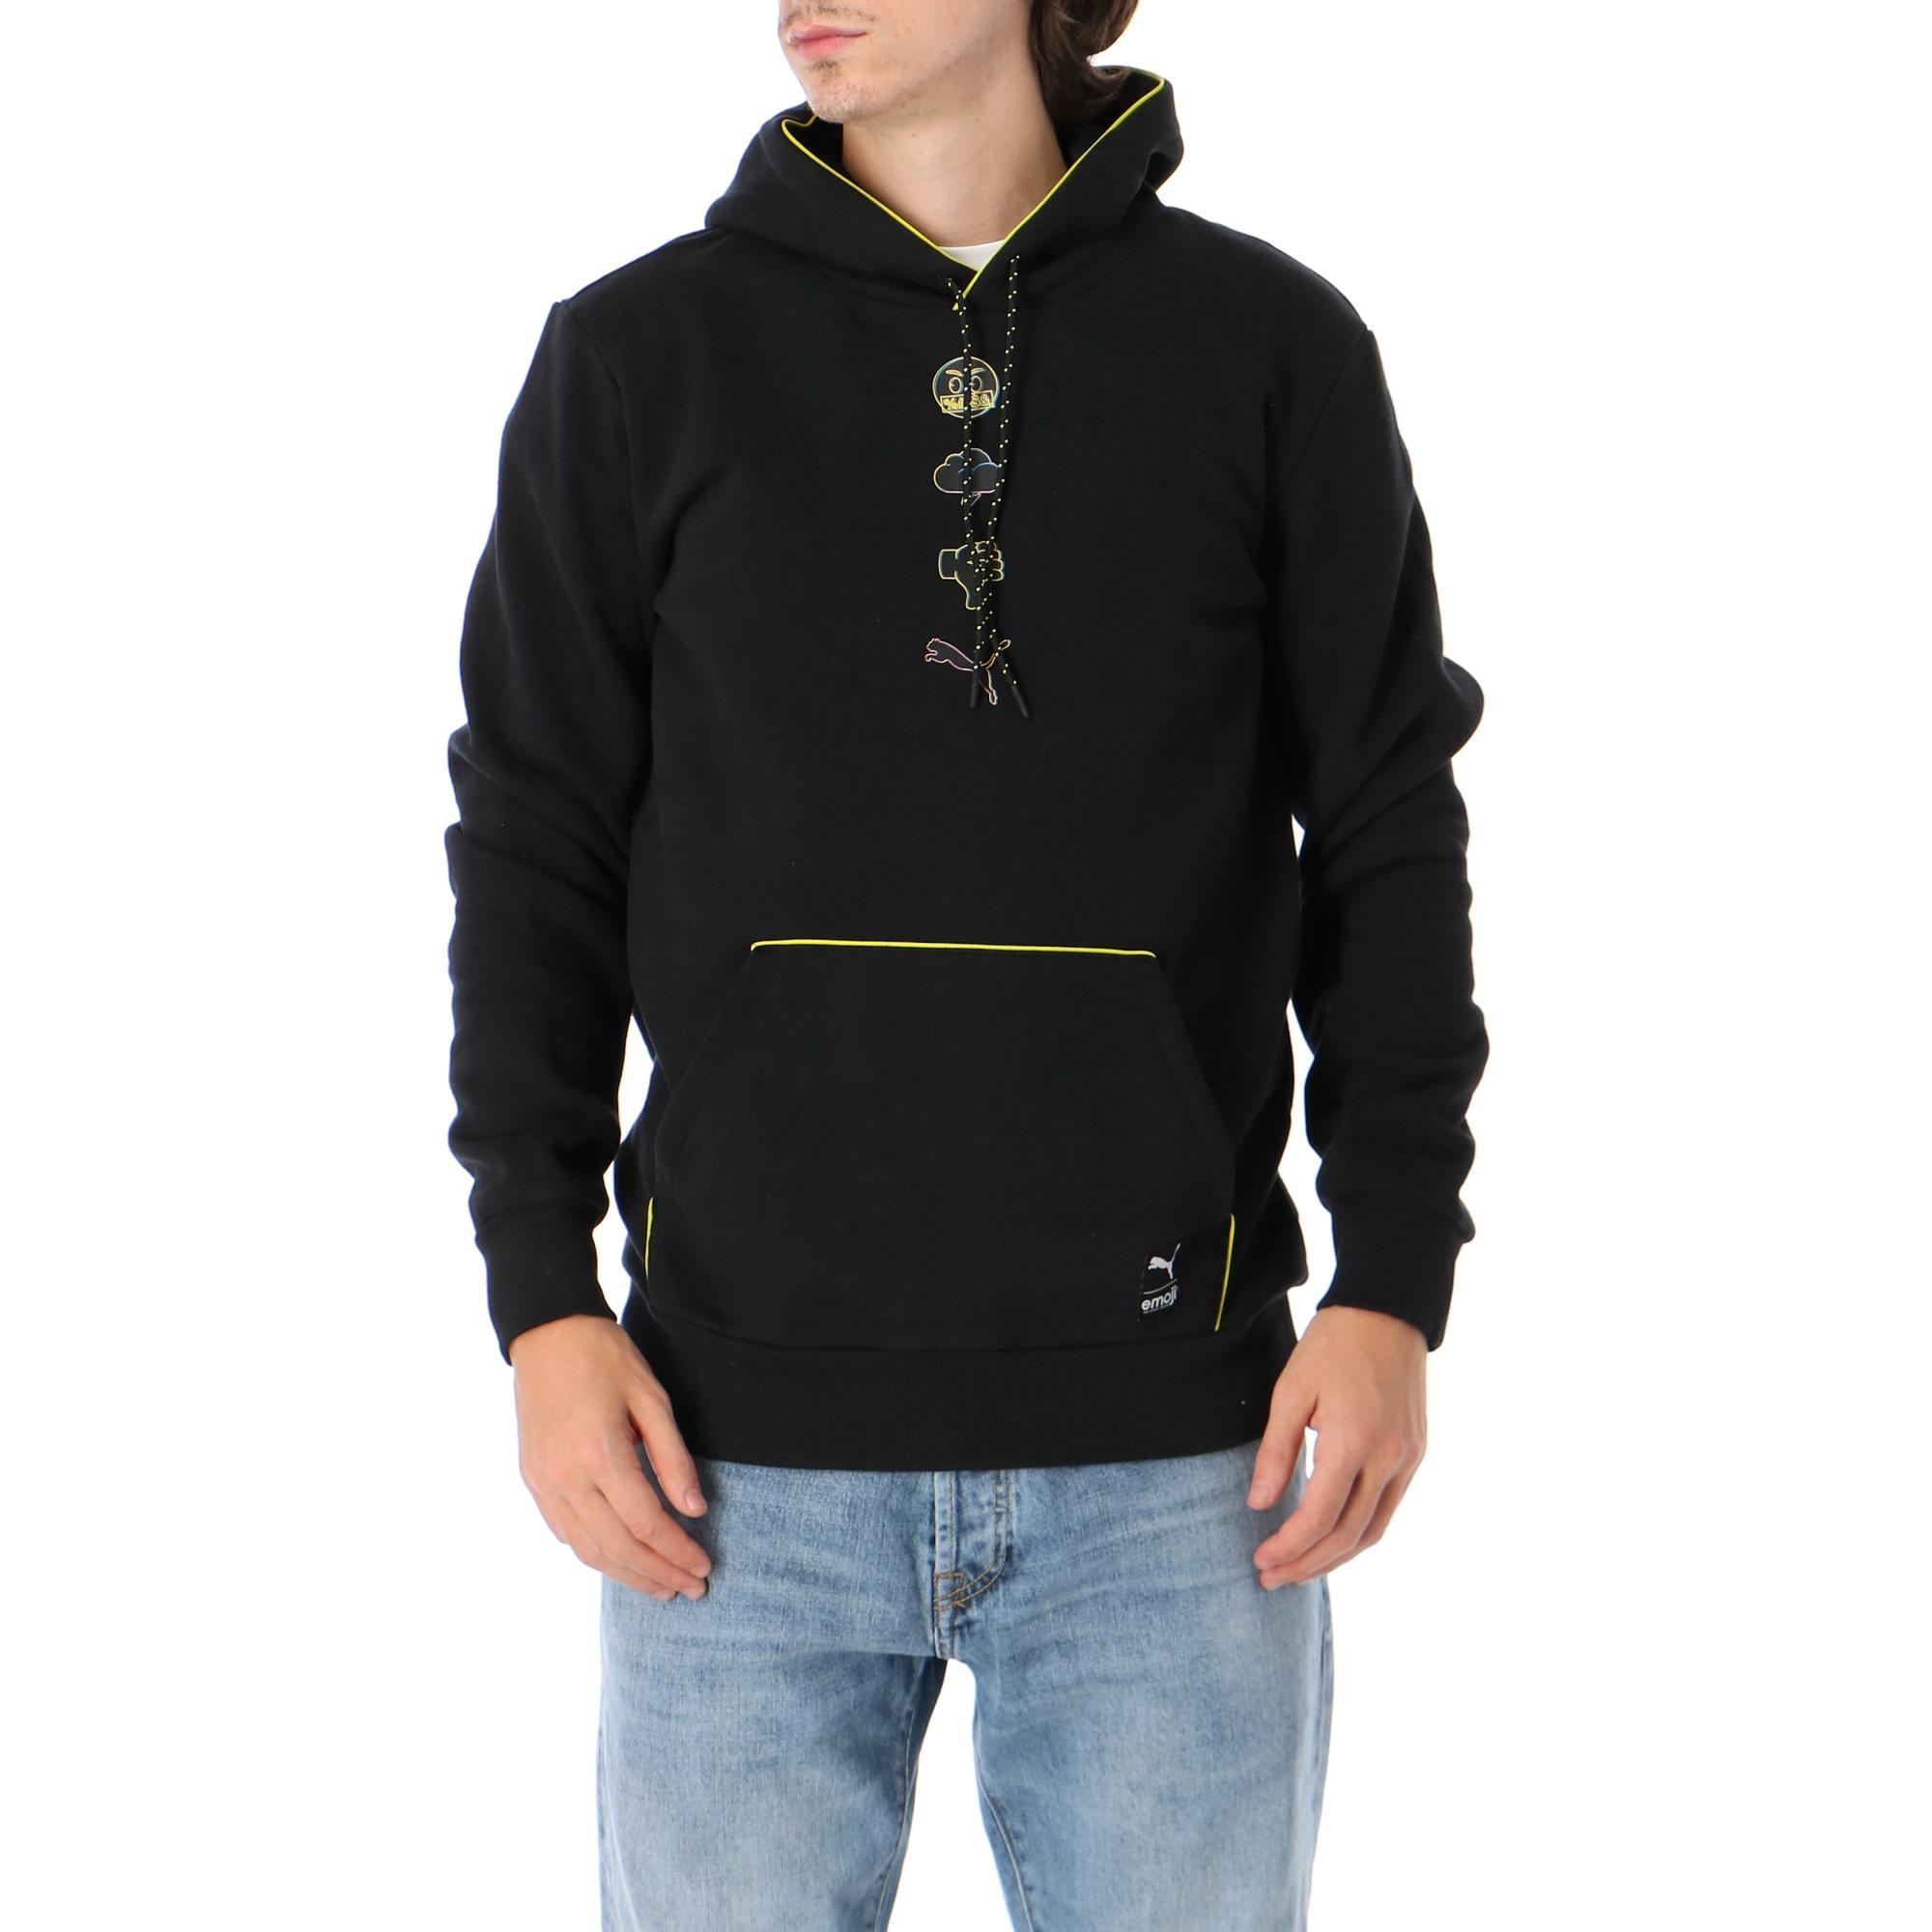 Puma X Emoji Hoodie Black